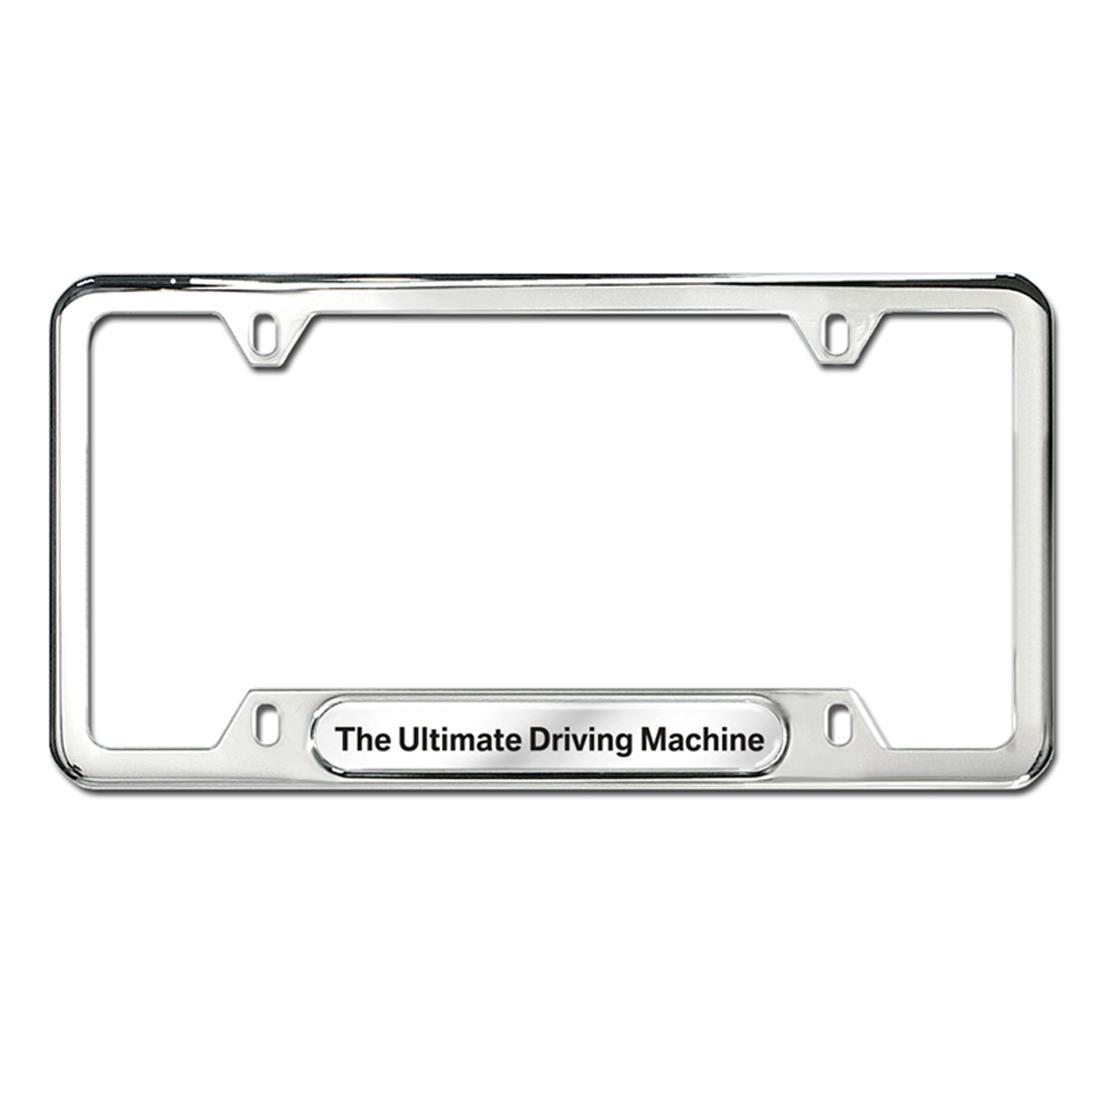 bmw the ultimate driving machine plate frame silver. Black Bedroom Furniture Sets. Home Design Ideas